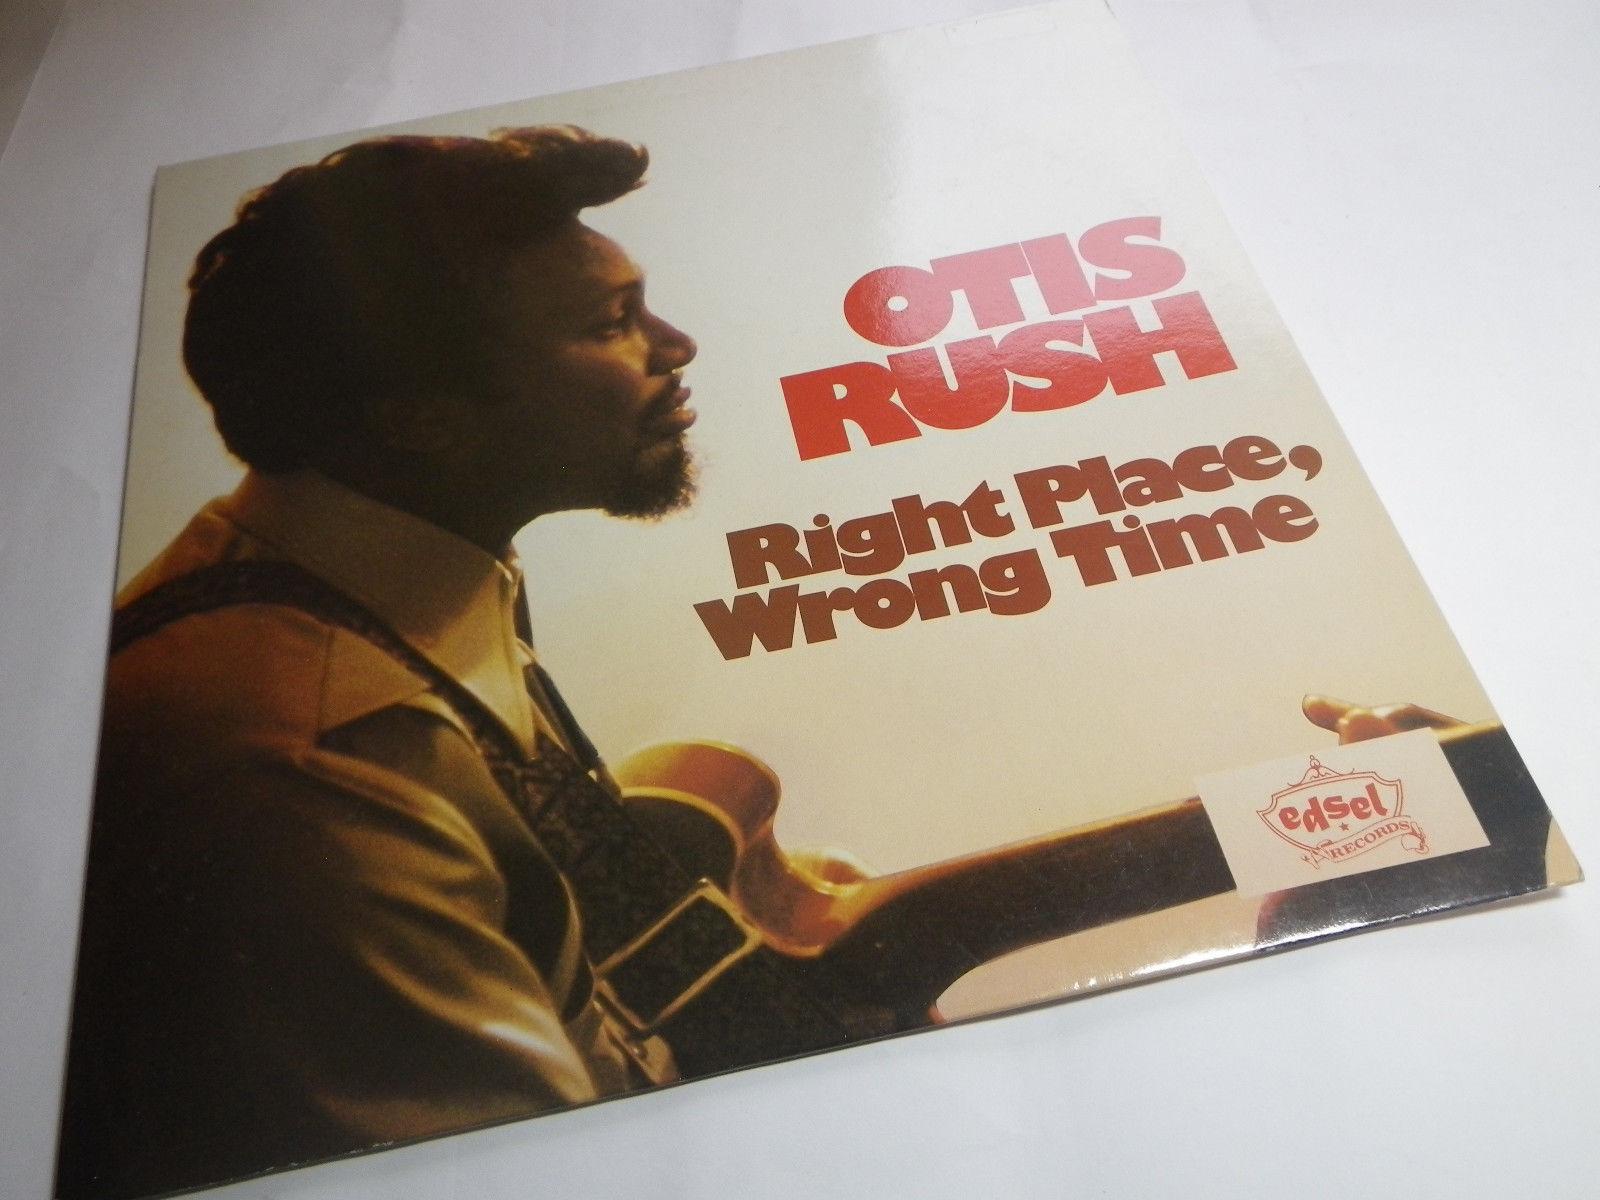 OTIS RUSH  RIGHT PLACE WRONG TIME   EDSEL 220